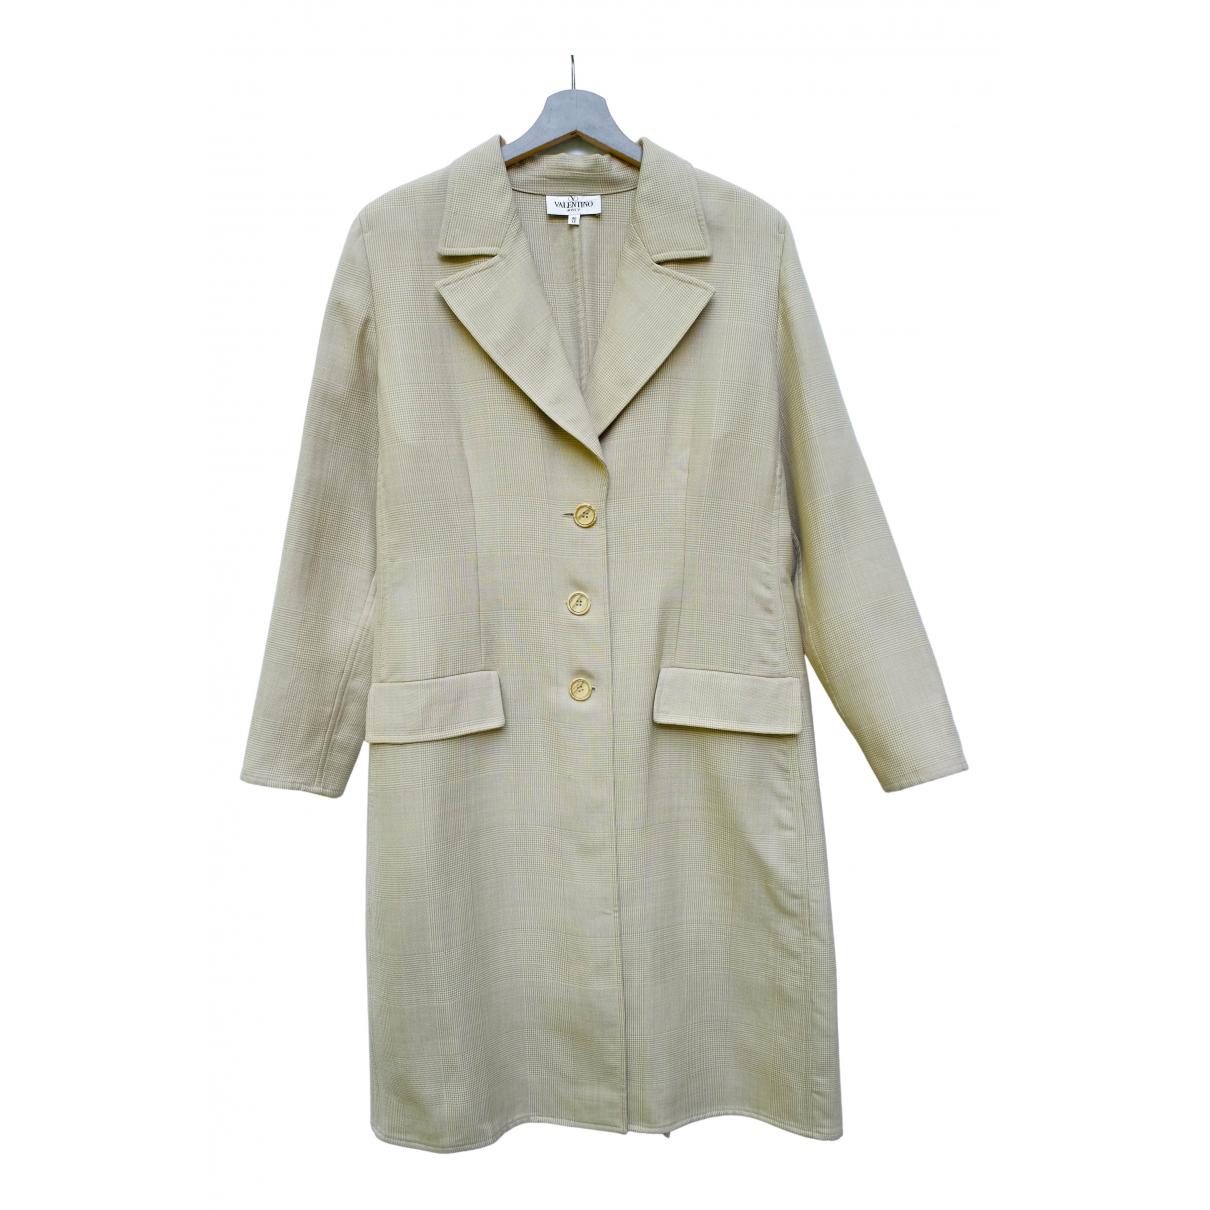 Valentino Garavani N Beige Wool coat for Women L International